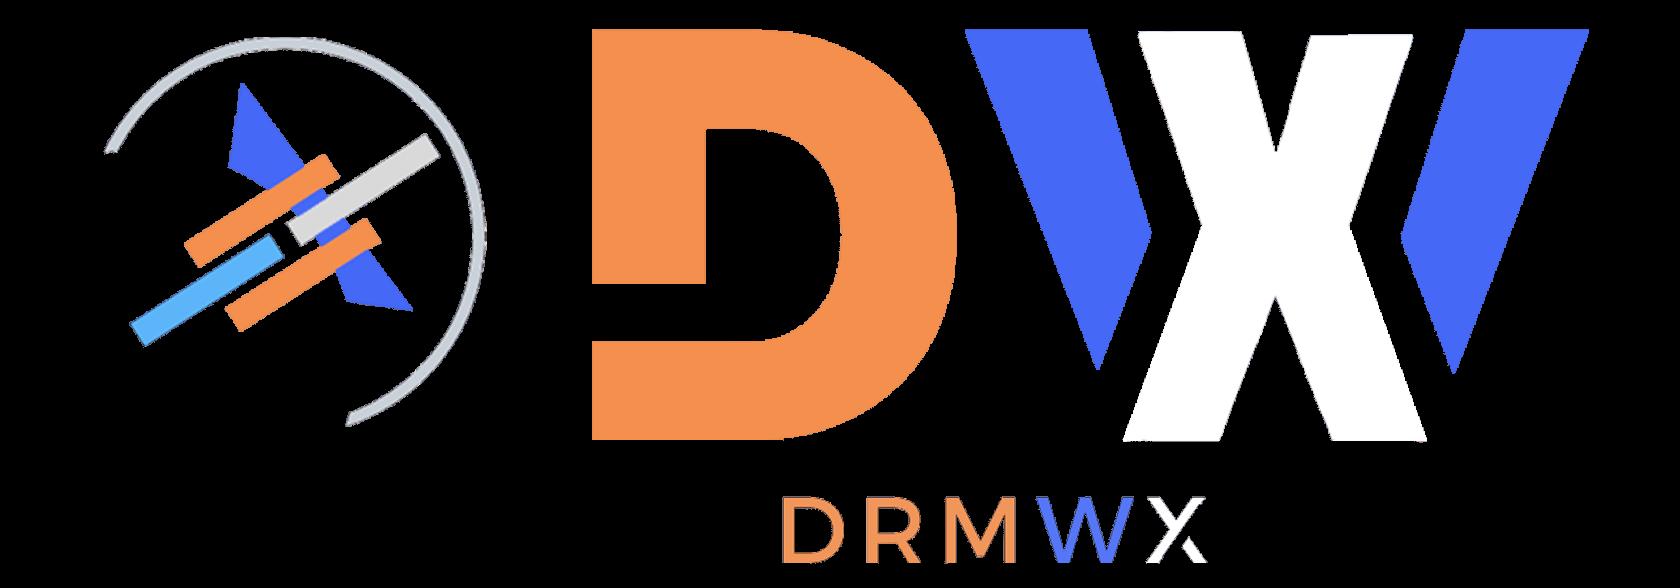 DRMWX Creative Agency